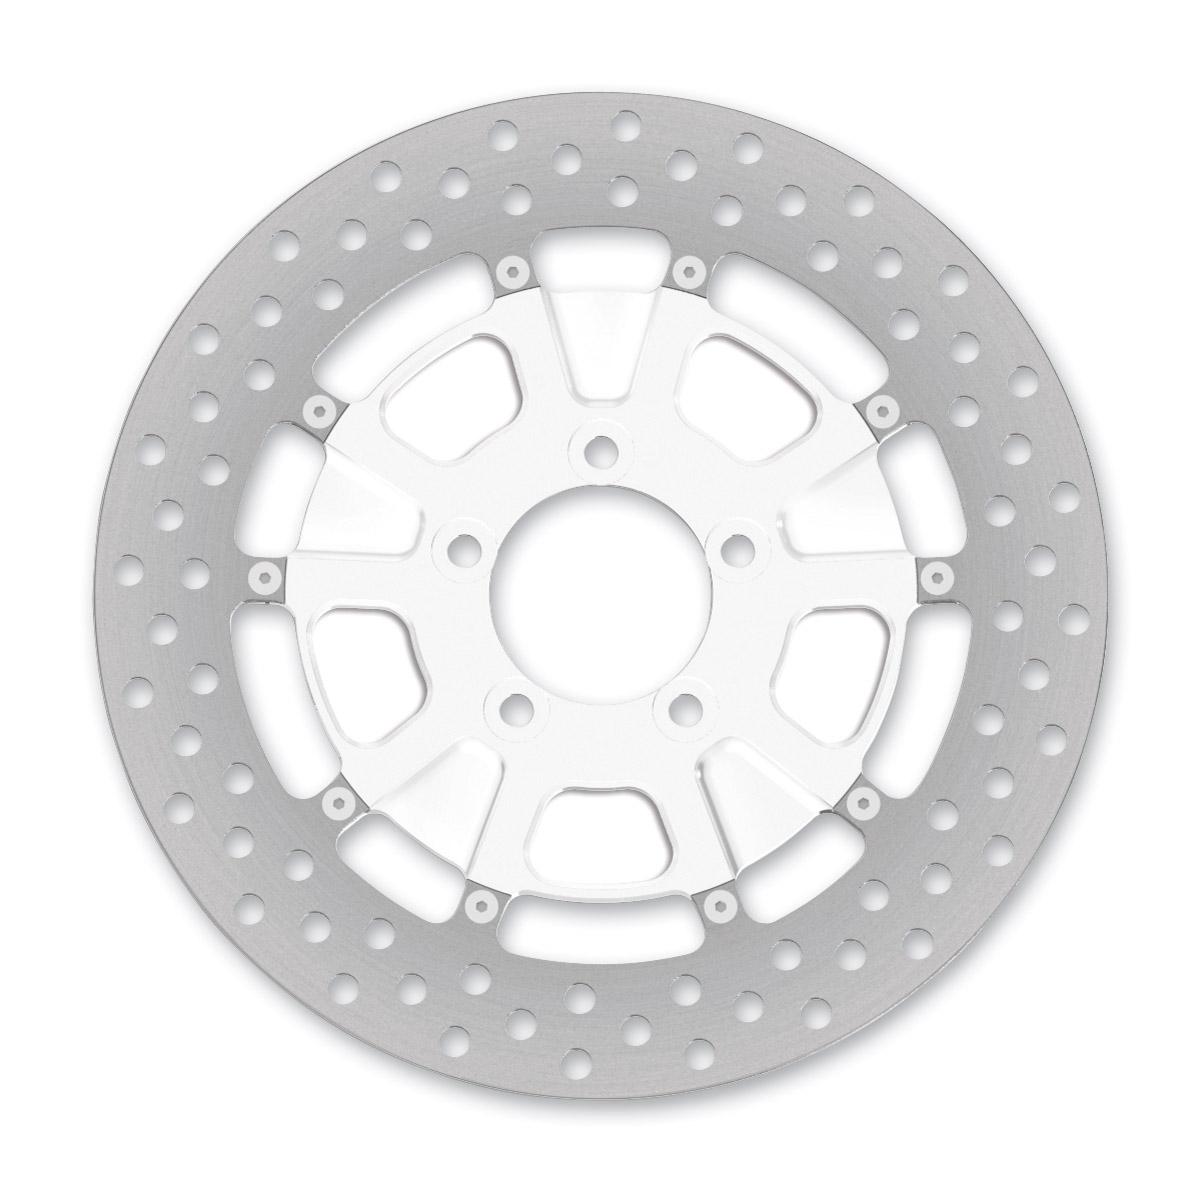 Roland Sands Design Raid Chrome Two-Piece Rear Brake Rotor, 11.5